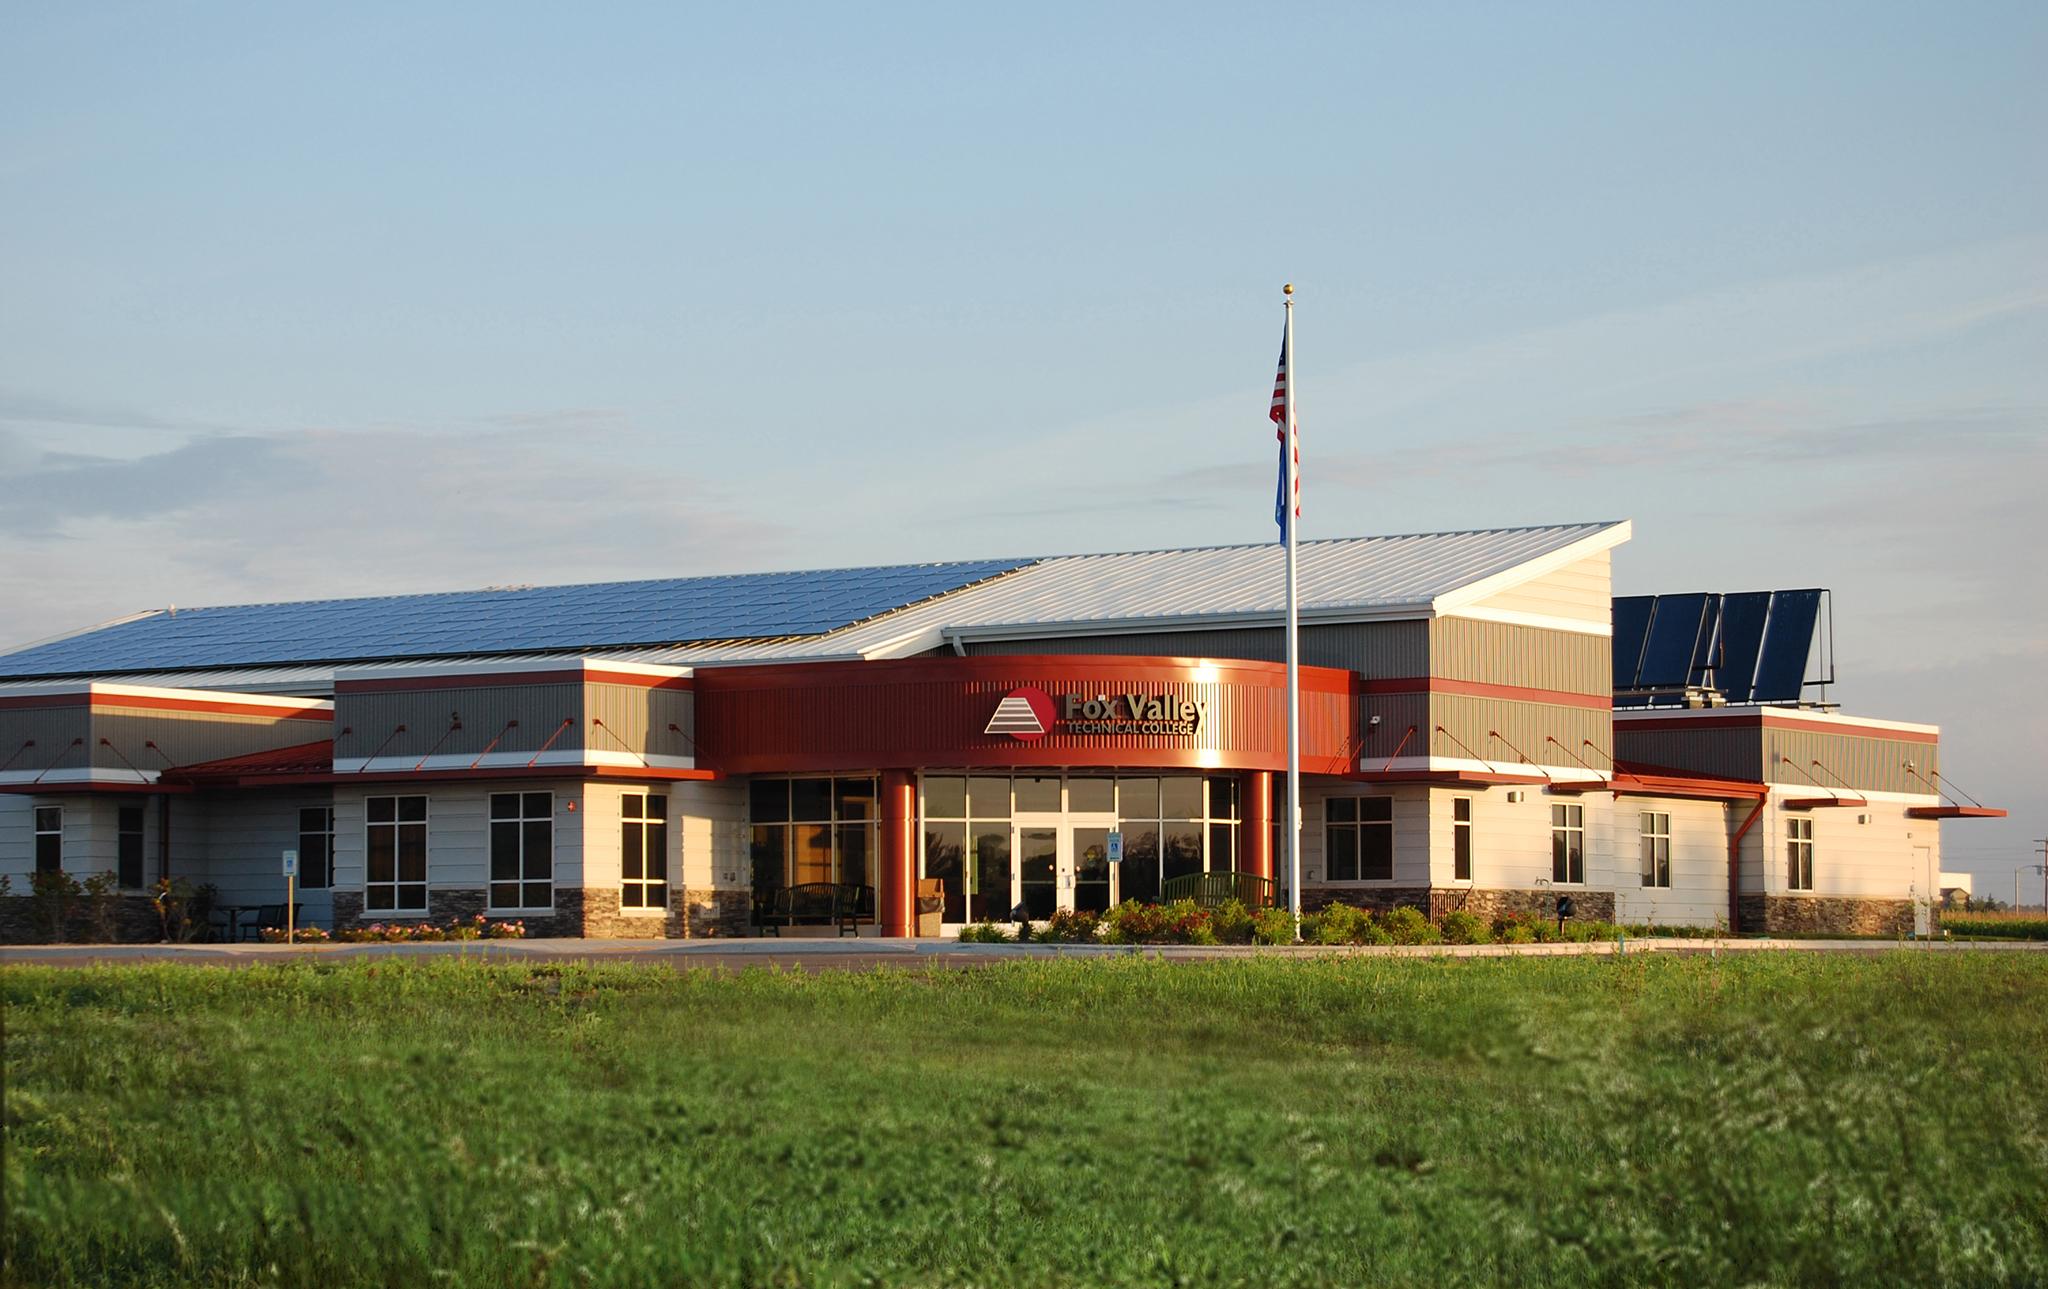 1_FVTC Regional Training Center